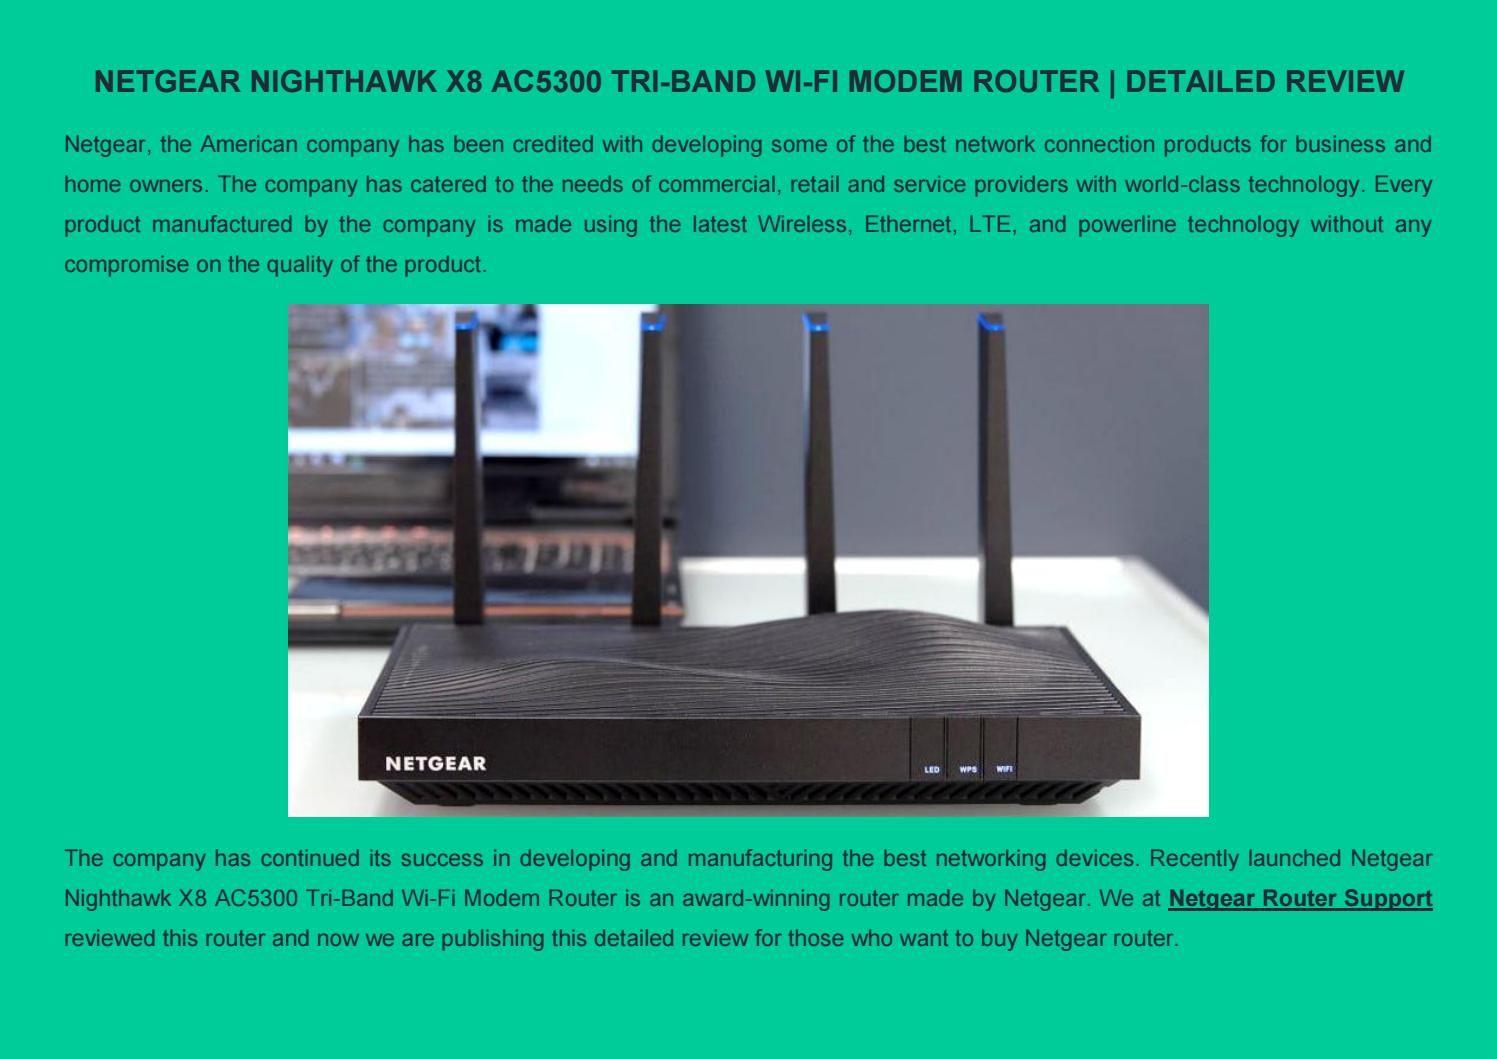 Netgear Nighthawk X8 AC5300 TriBand WiFi Modem Router